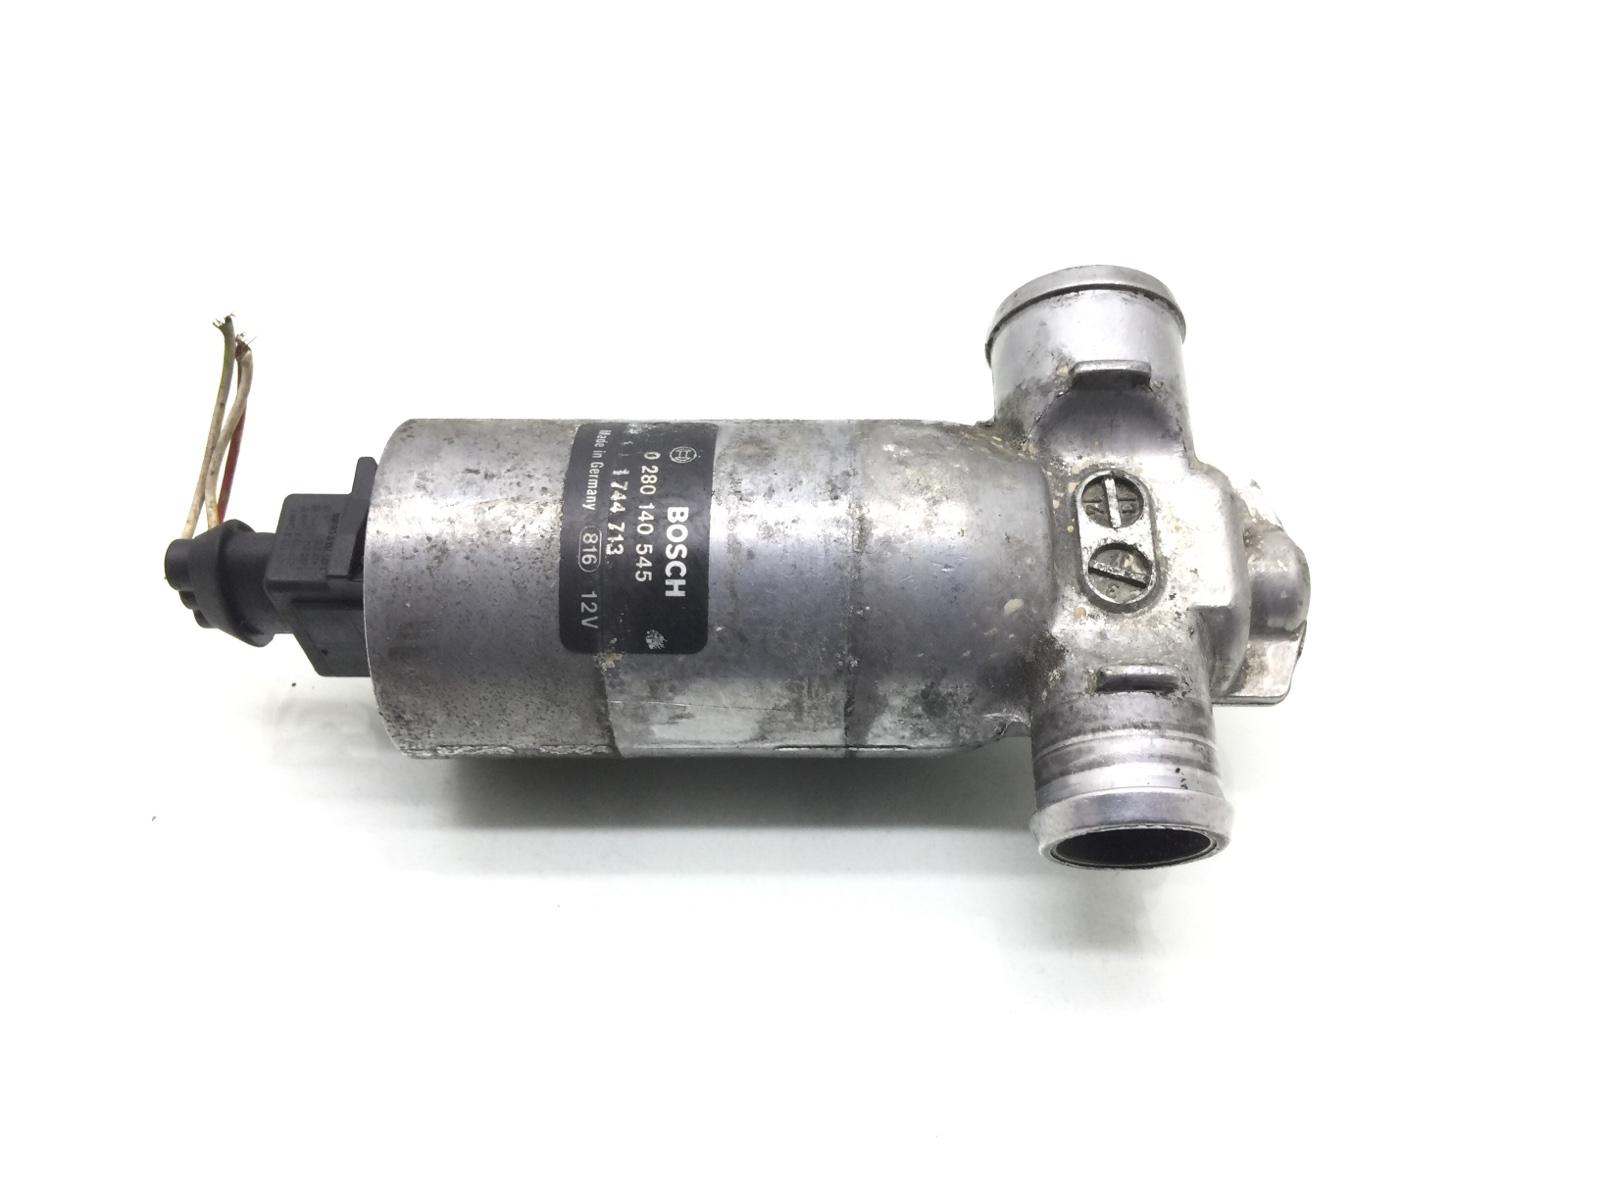 Клапан холостого хода Bmw 5 E39 2.5 I 2001 (б/у)